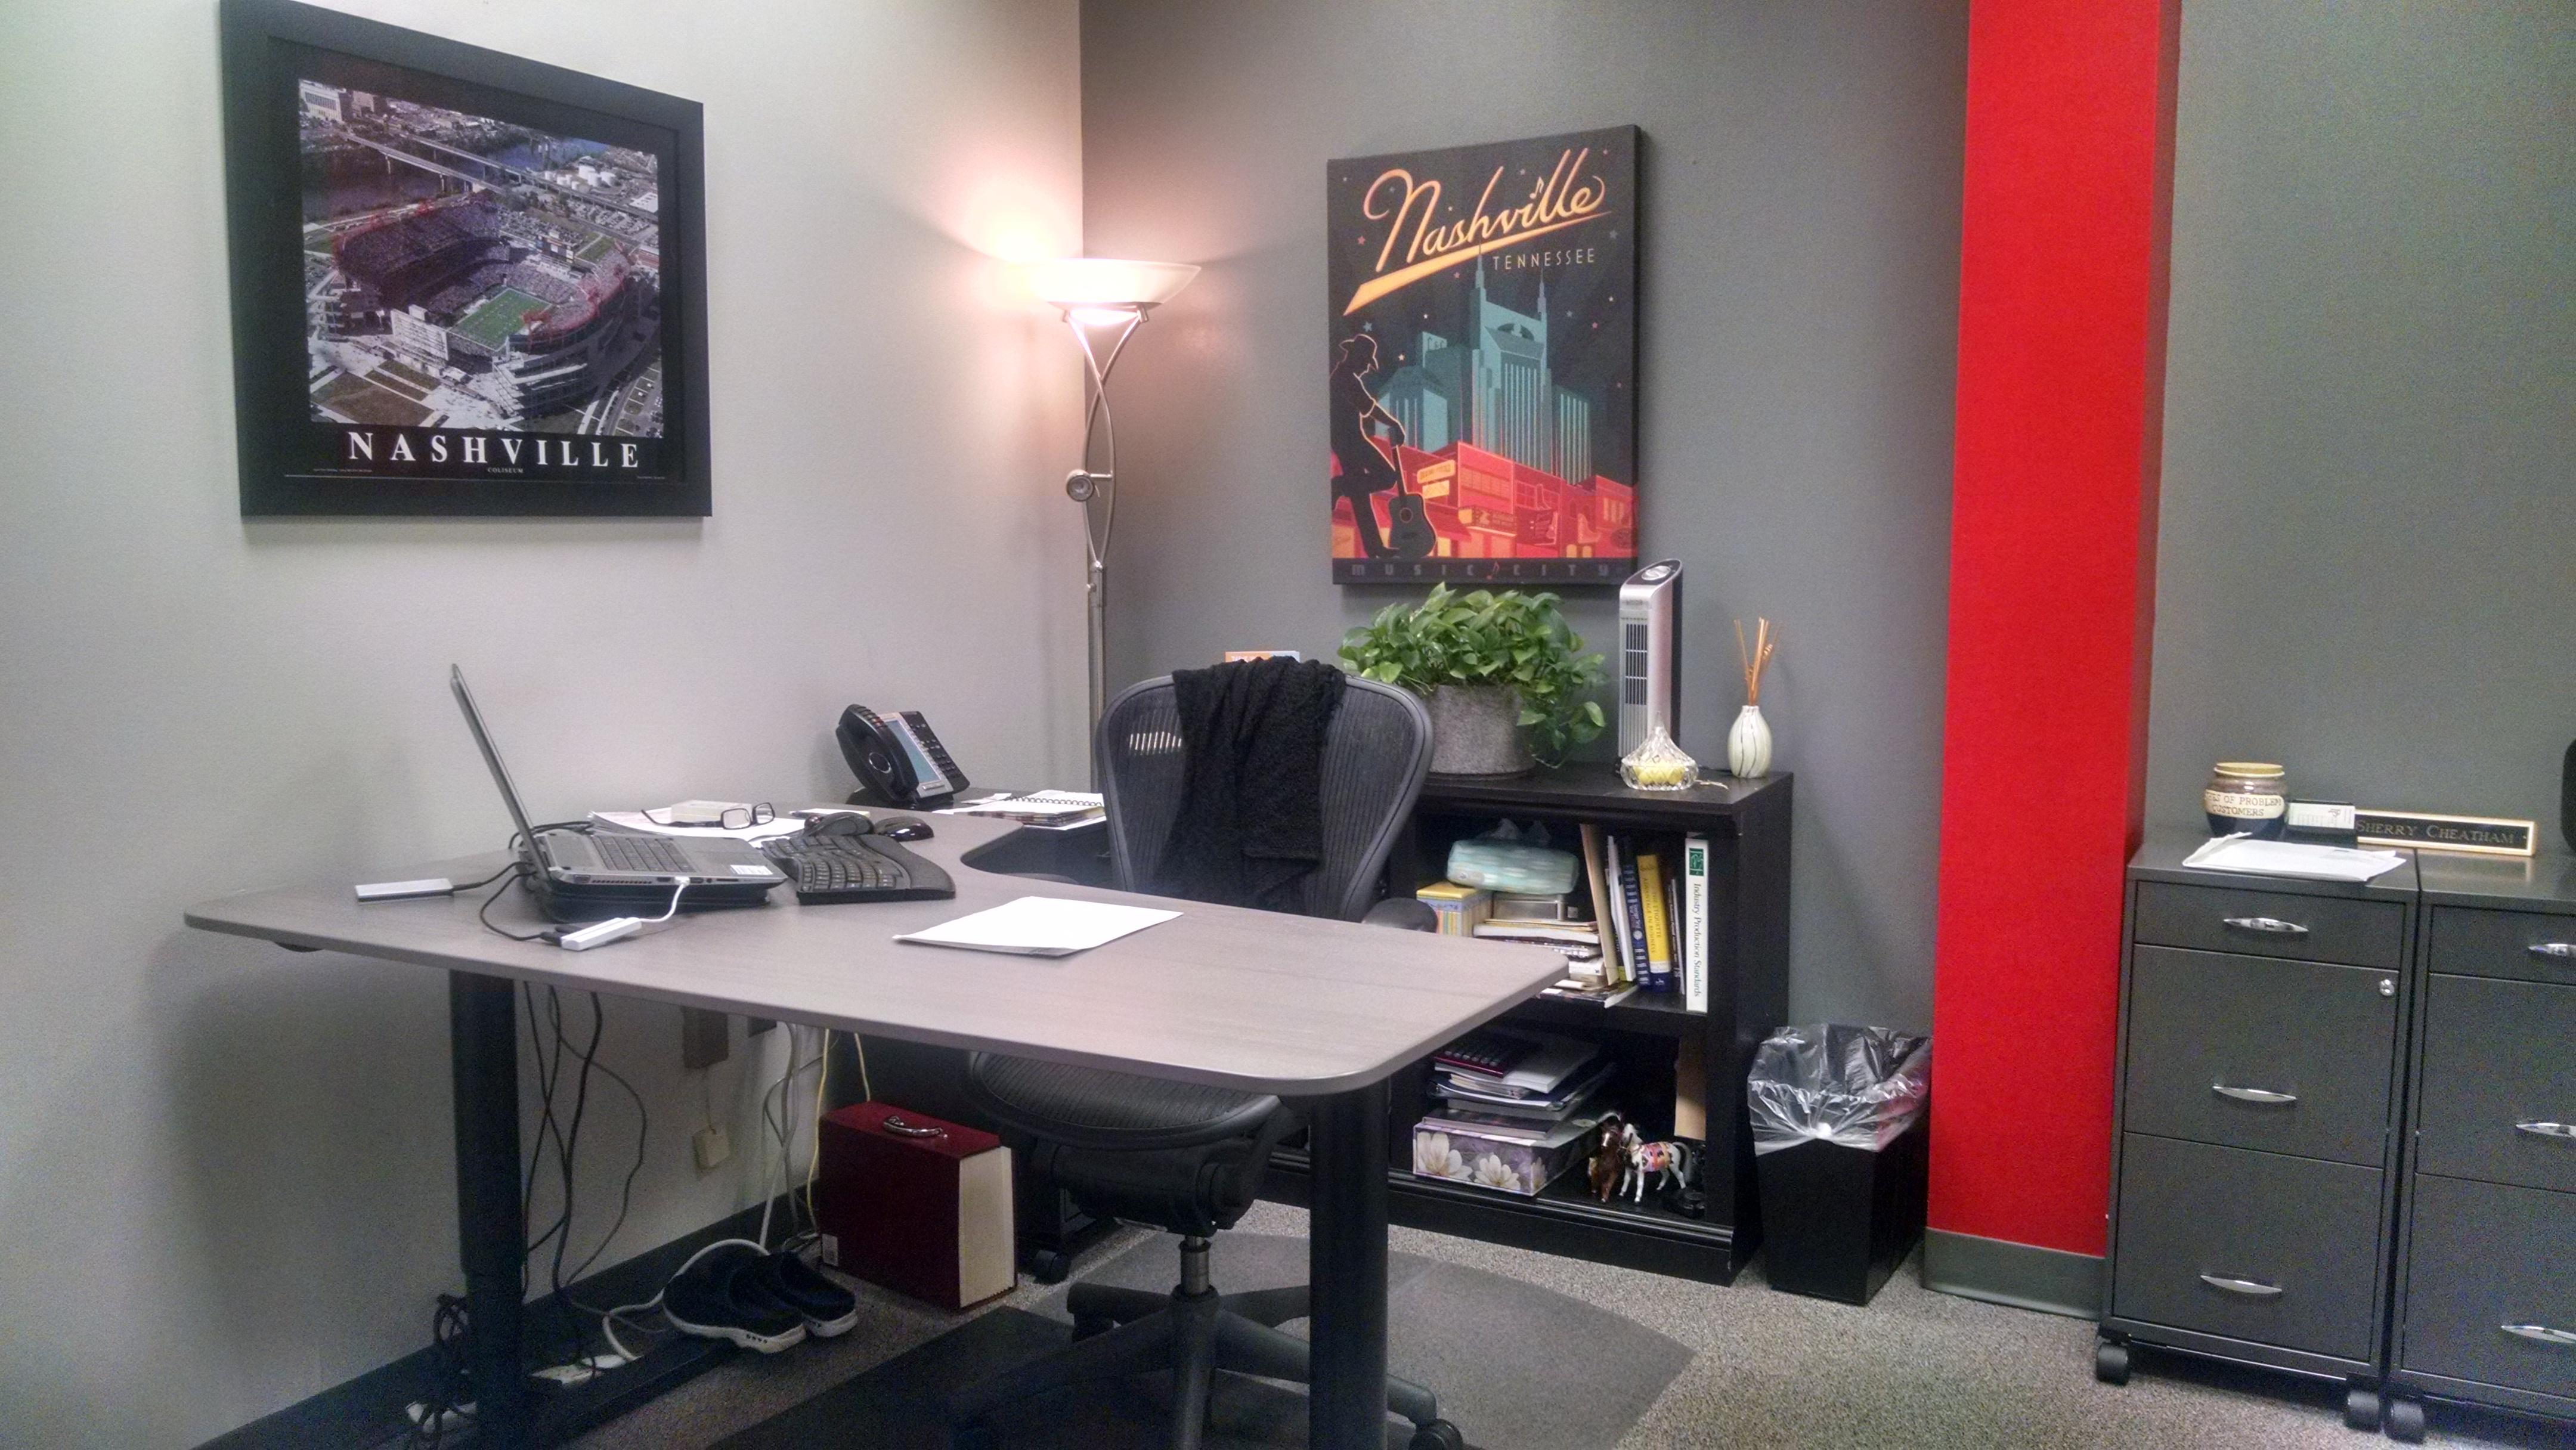 Blog Series Updating Our Nashville Office Space Post 3 General Manager Office Nashville Office Space 615 781 4200